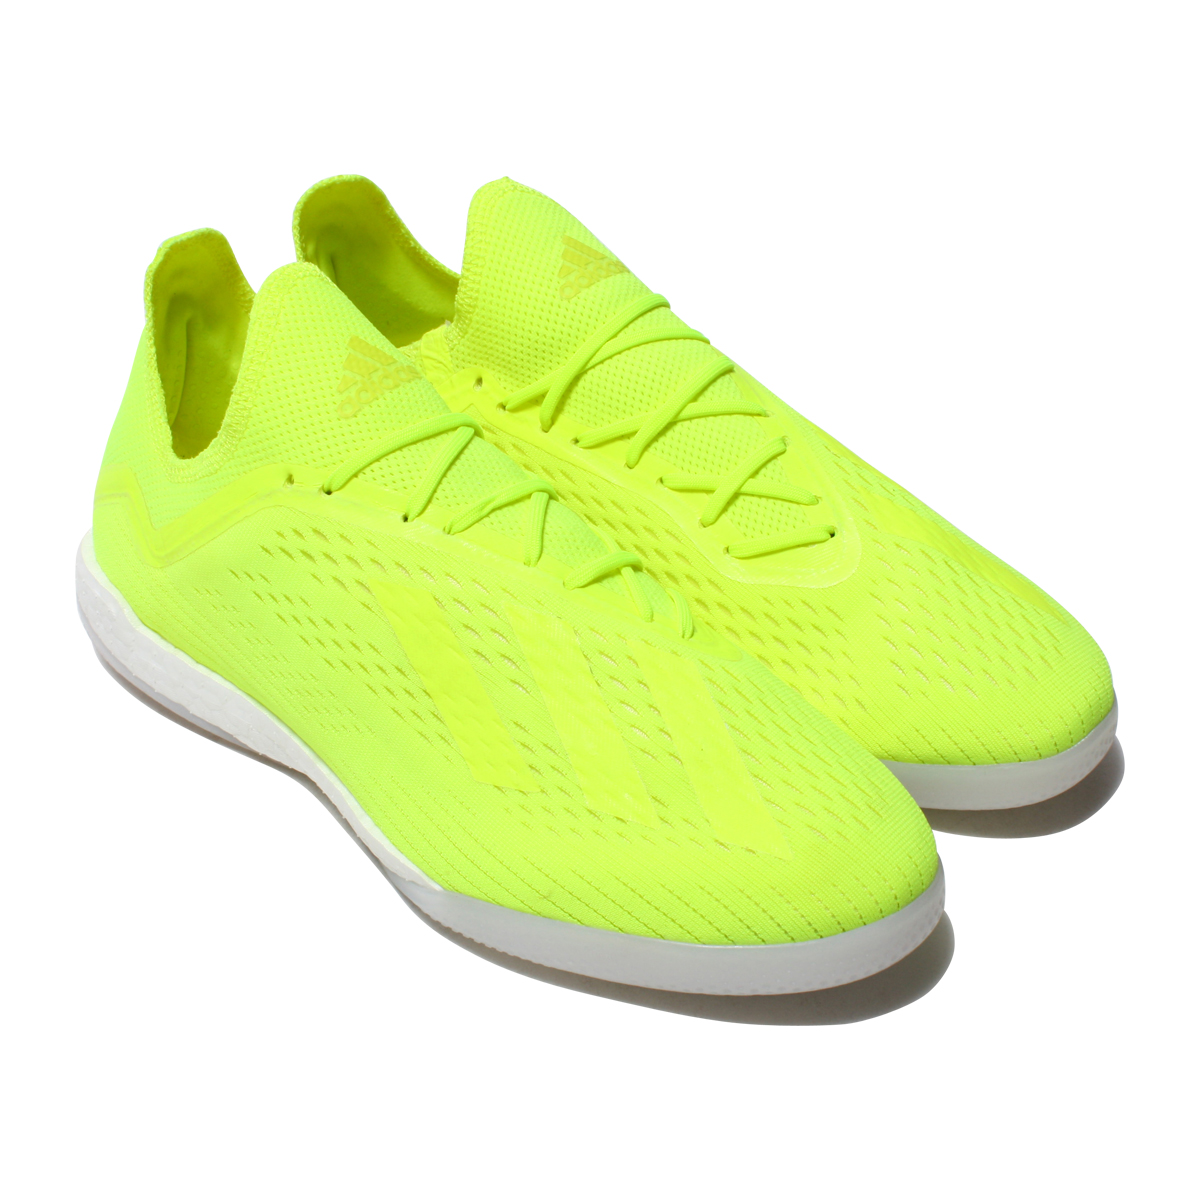 the latest f5630 3396d adidas X TANGO 18.1 TR (Adidas X tango 18.1 TR) SOLAR YELLOW/SOLAR  YELLOW/CORE BLACK 18FW-I